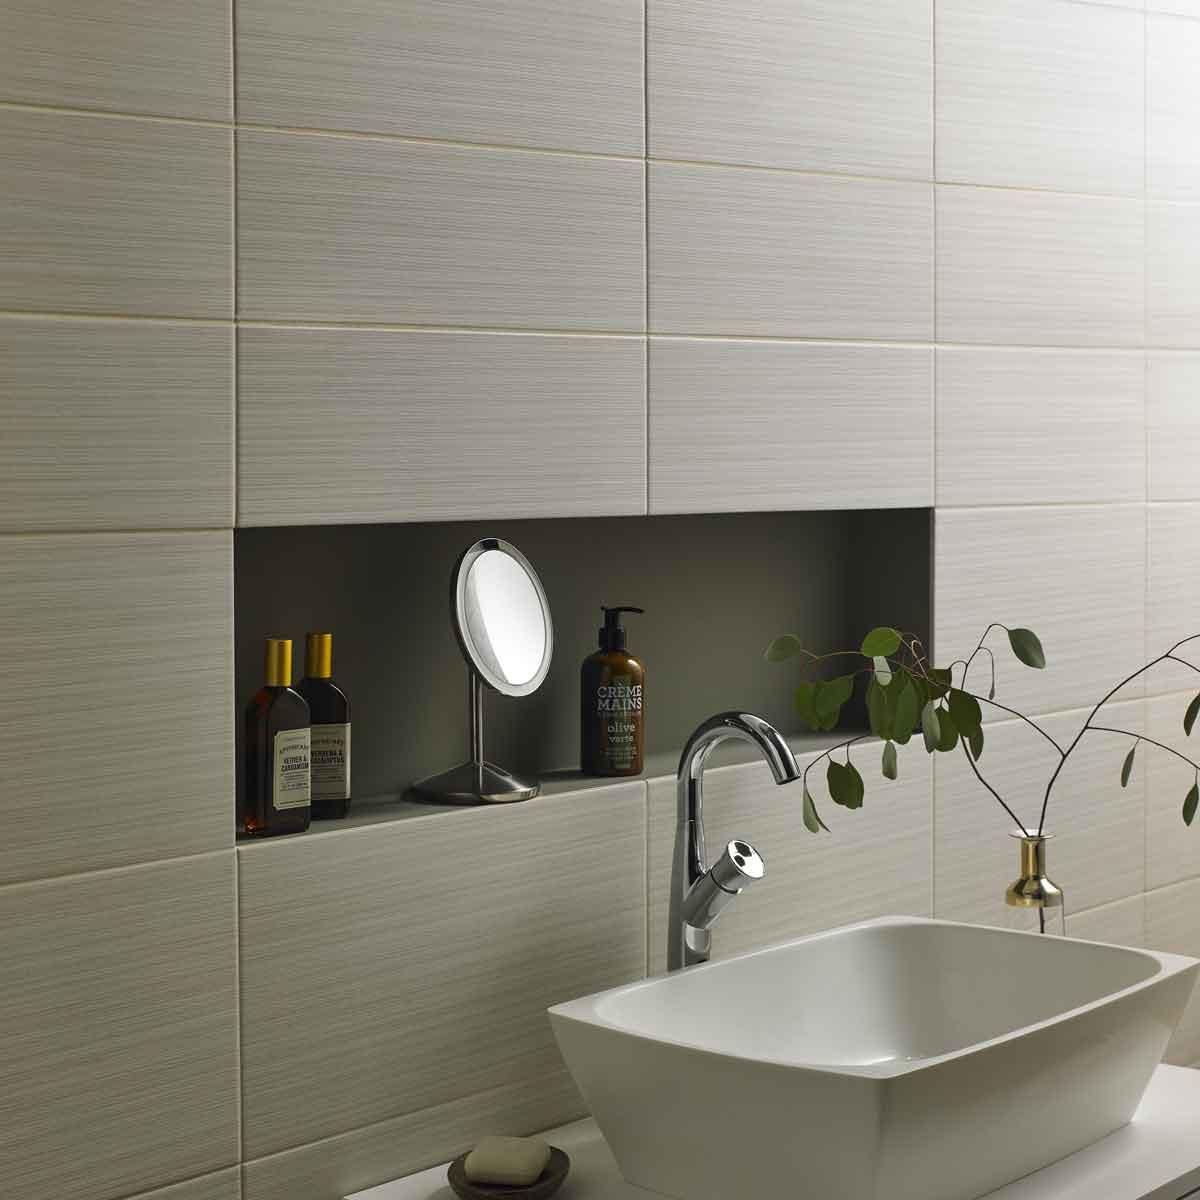 British ceramic tile luna glow beige matt wall floor british british ceramic tile luna glow beige matt wall floor british ceramic tile dailygadgetfo Gallery